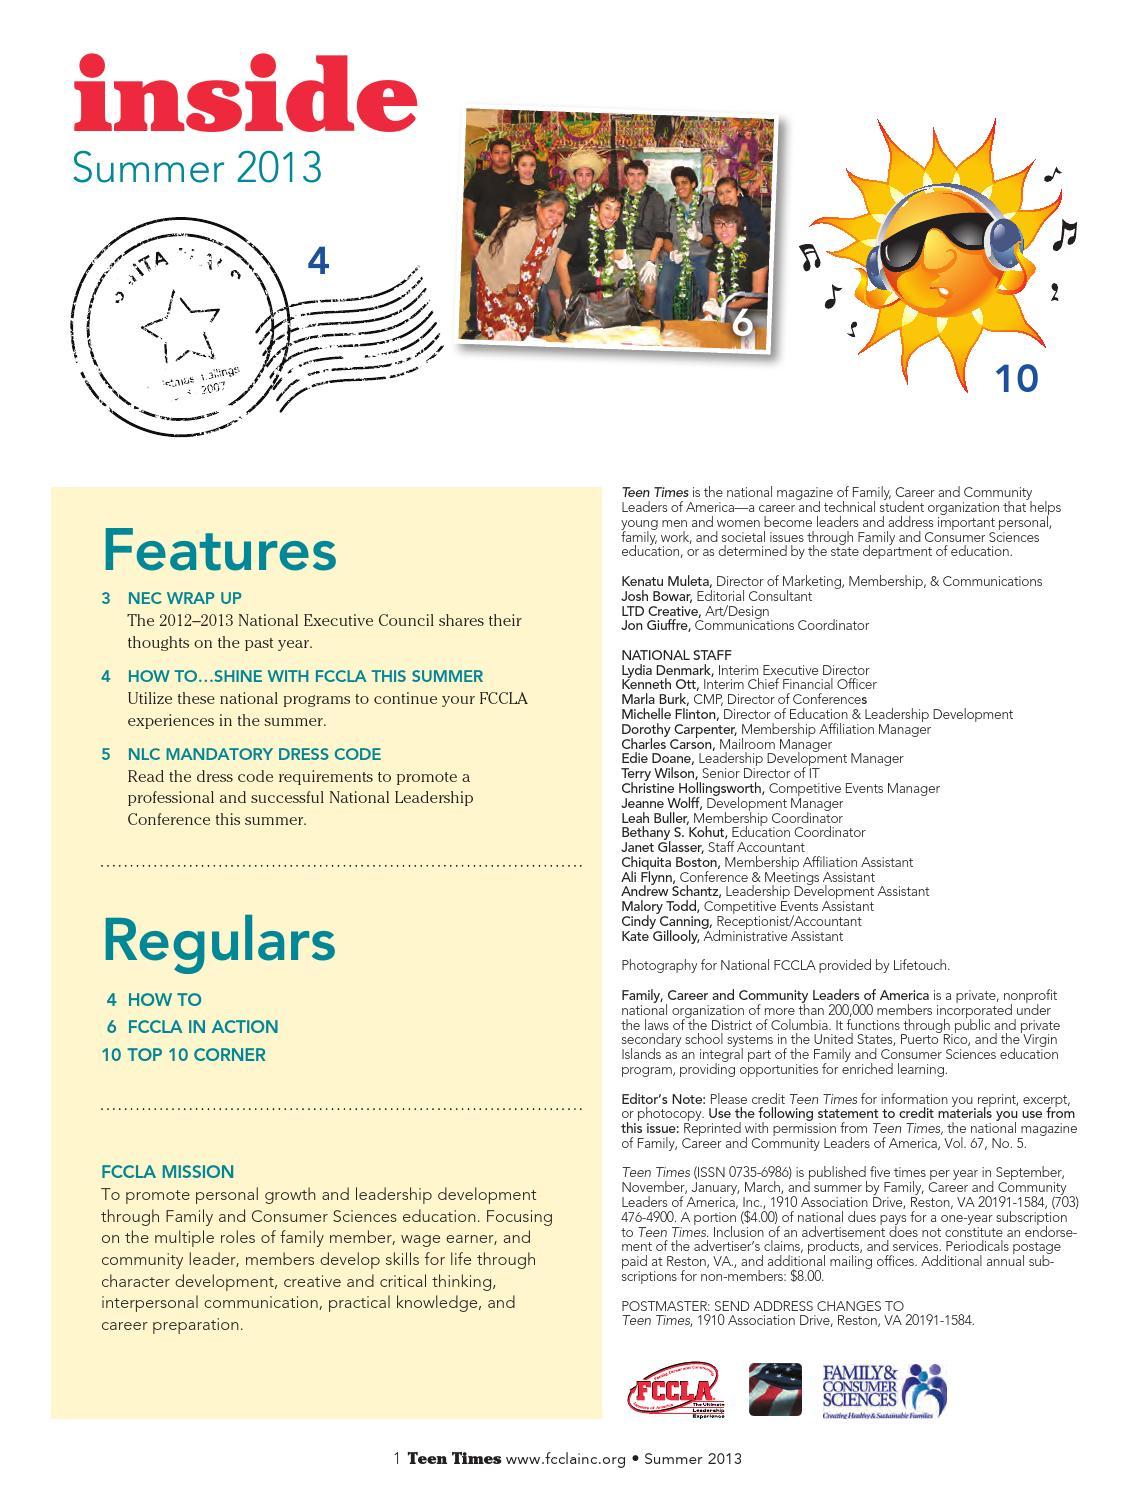 Teen Times Summer 2013 by FCCLA - issuu